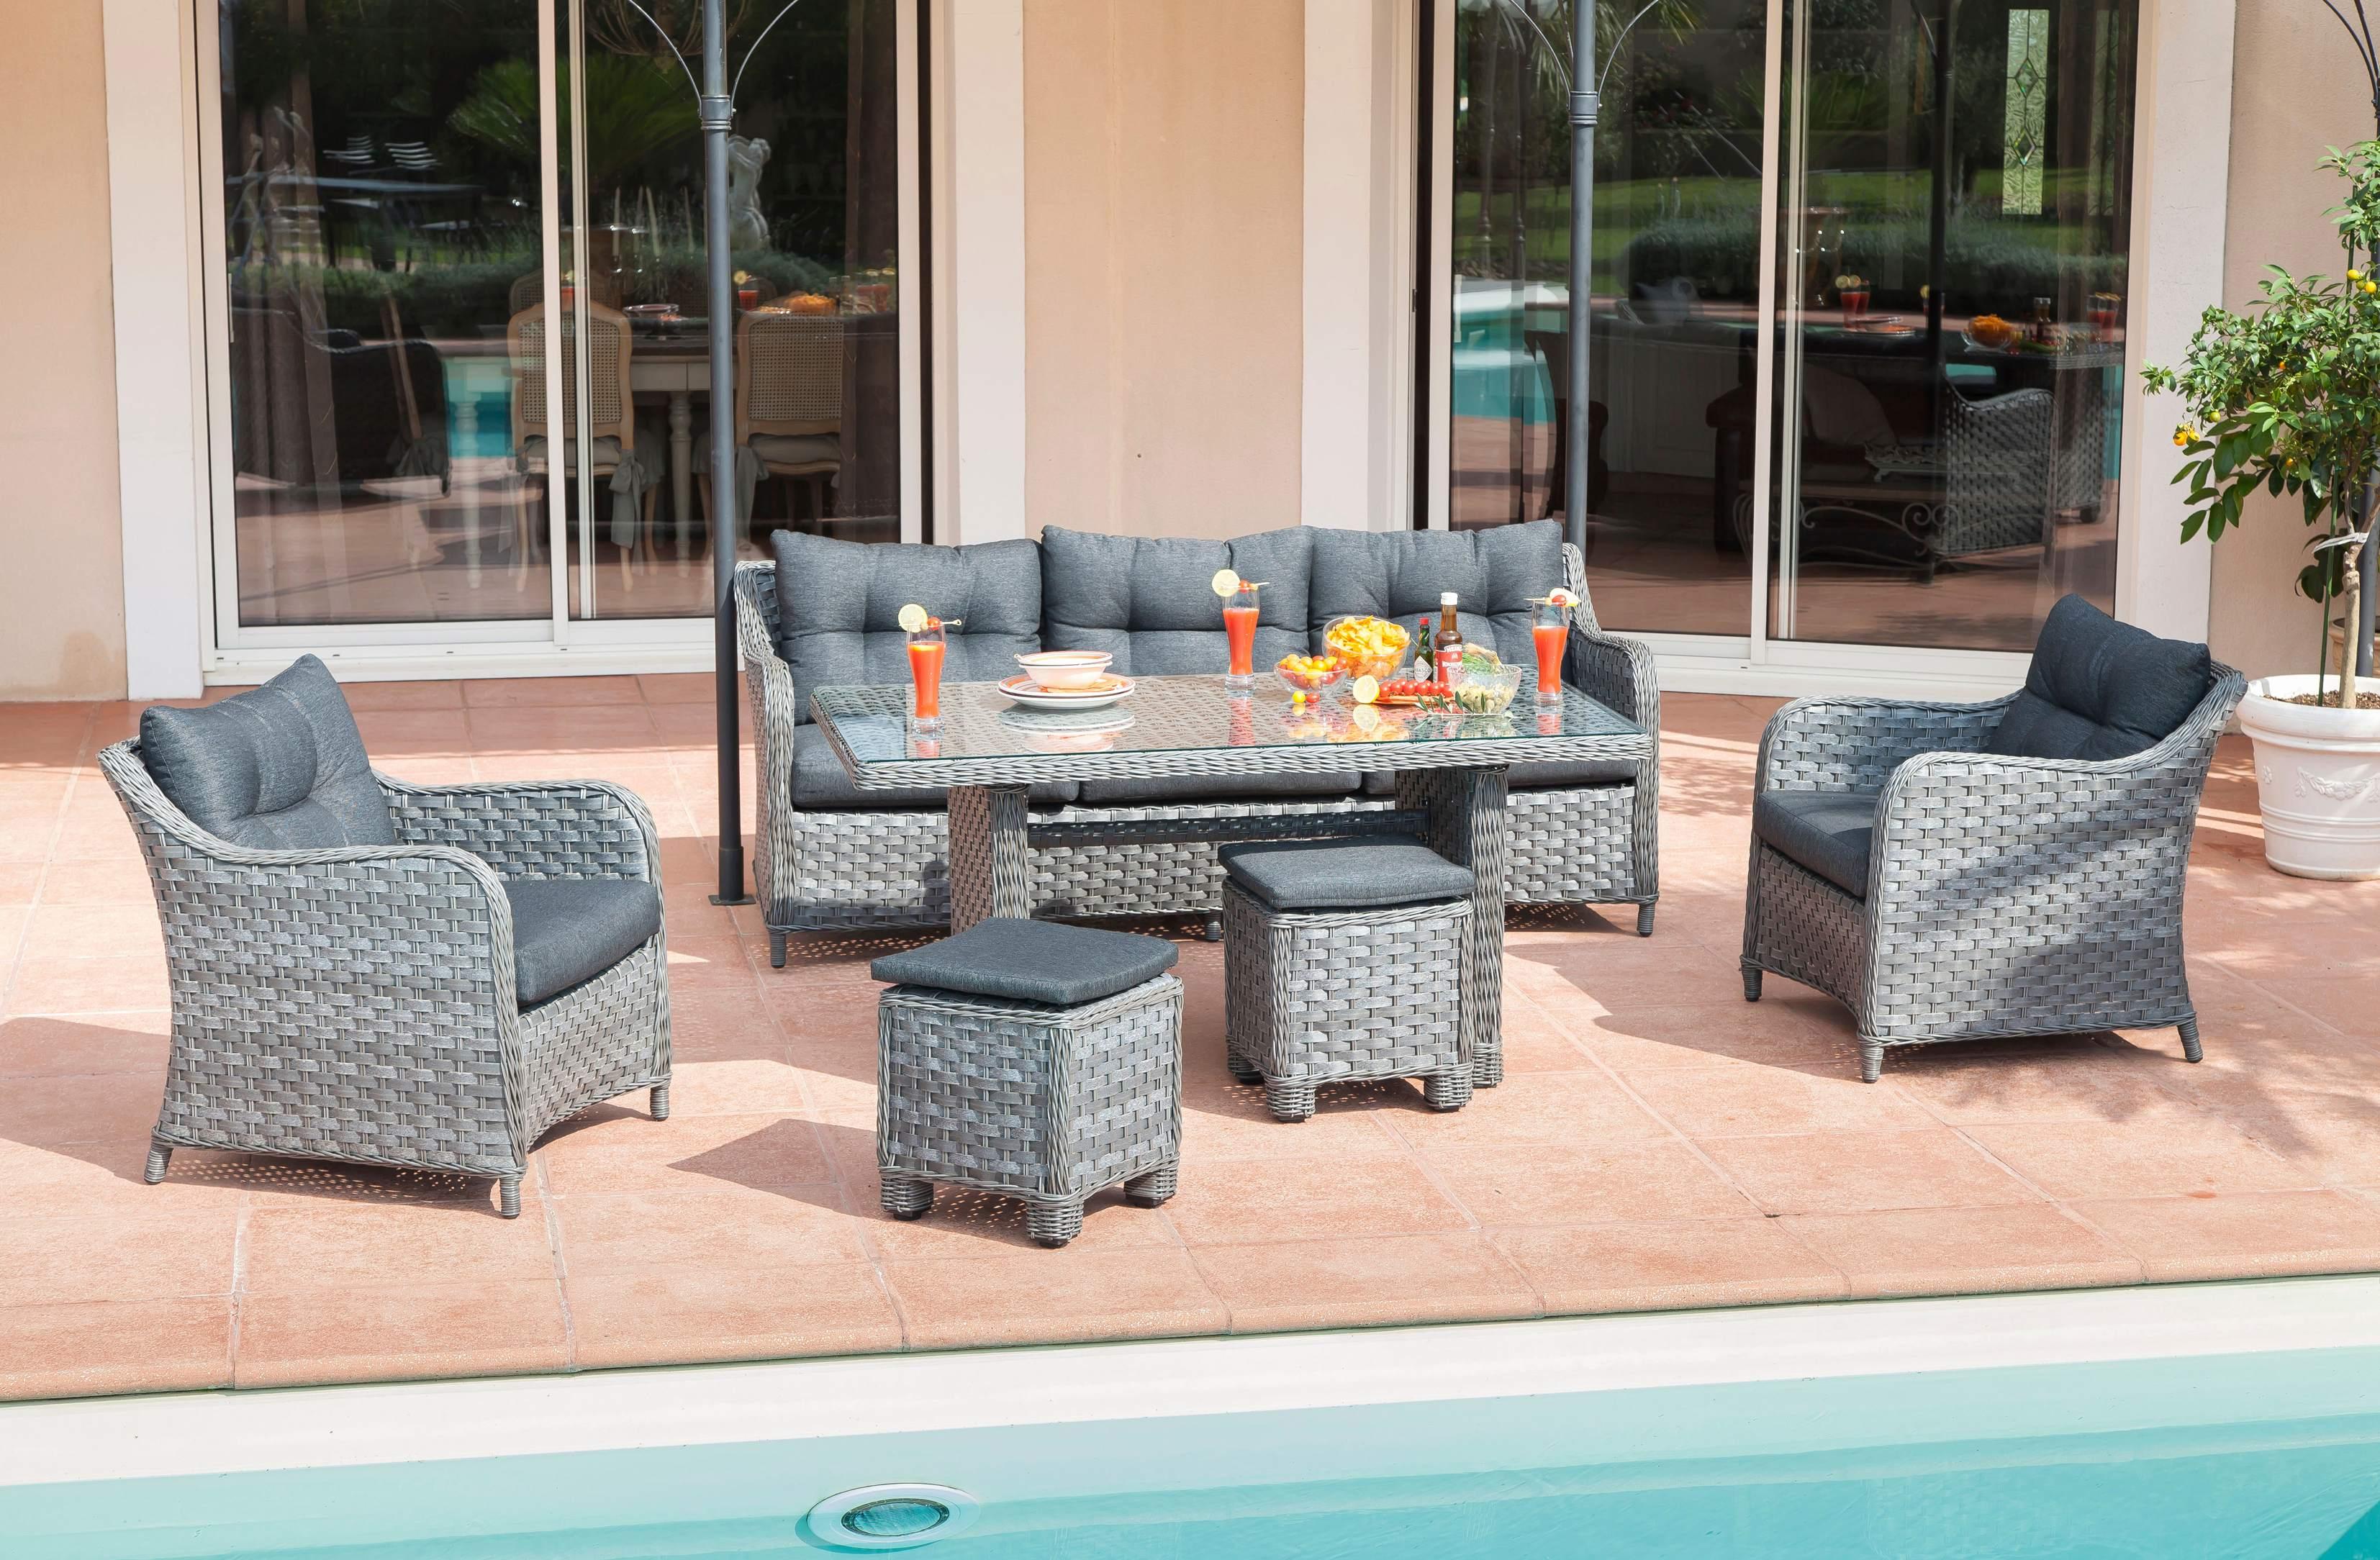 salon de jardin monte jardiland jardin piscine et cabane. Black Bedroom Furniture Sets. Home Design Ideas